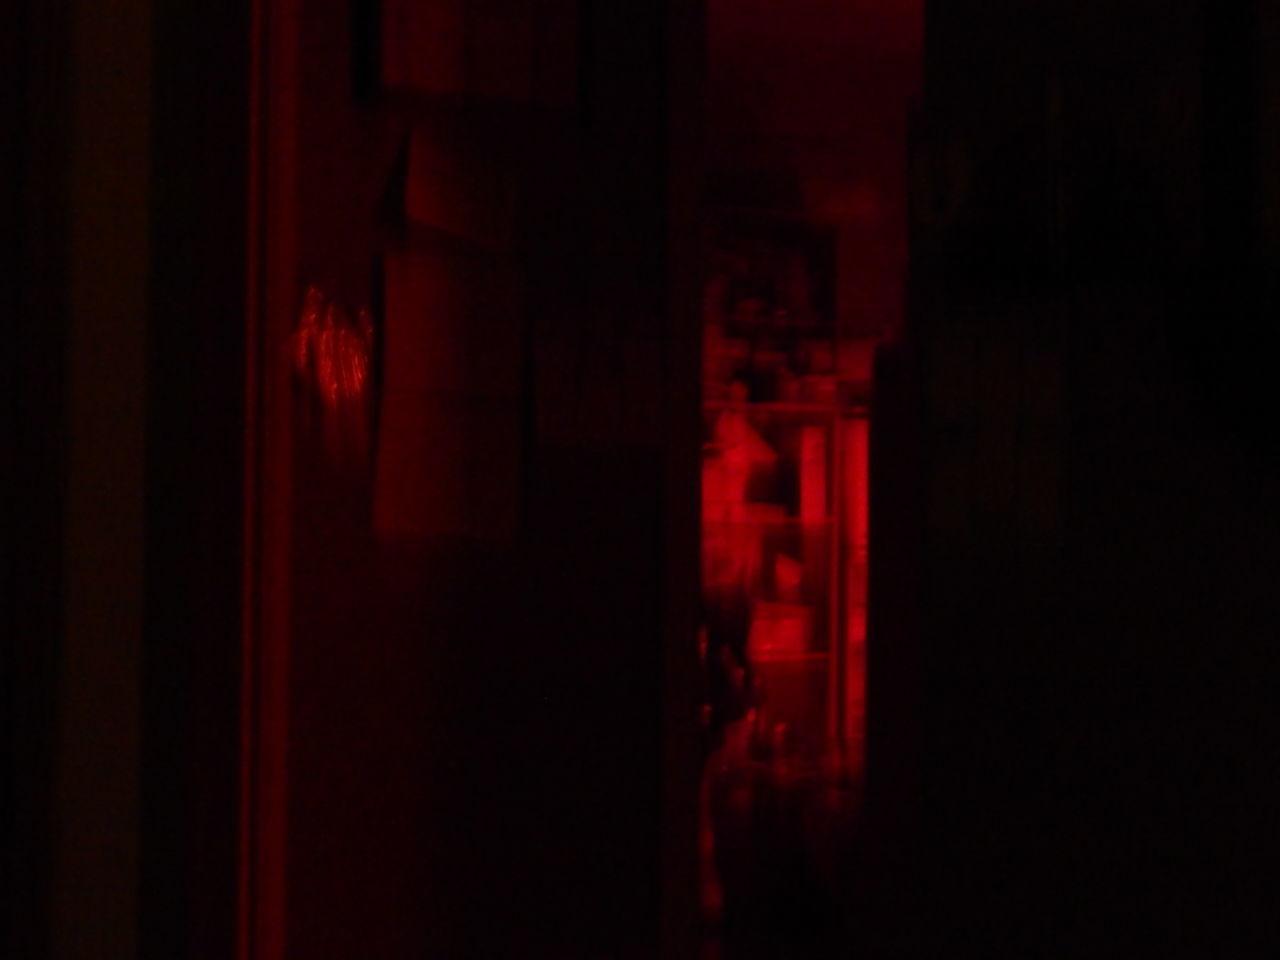 red, indoors, no people, illuminated, night, close-up